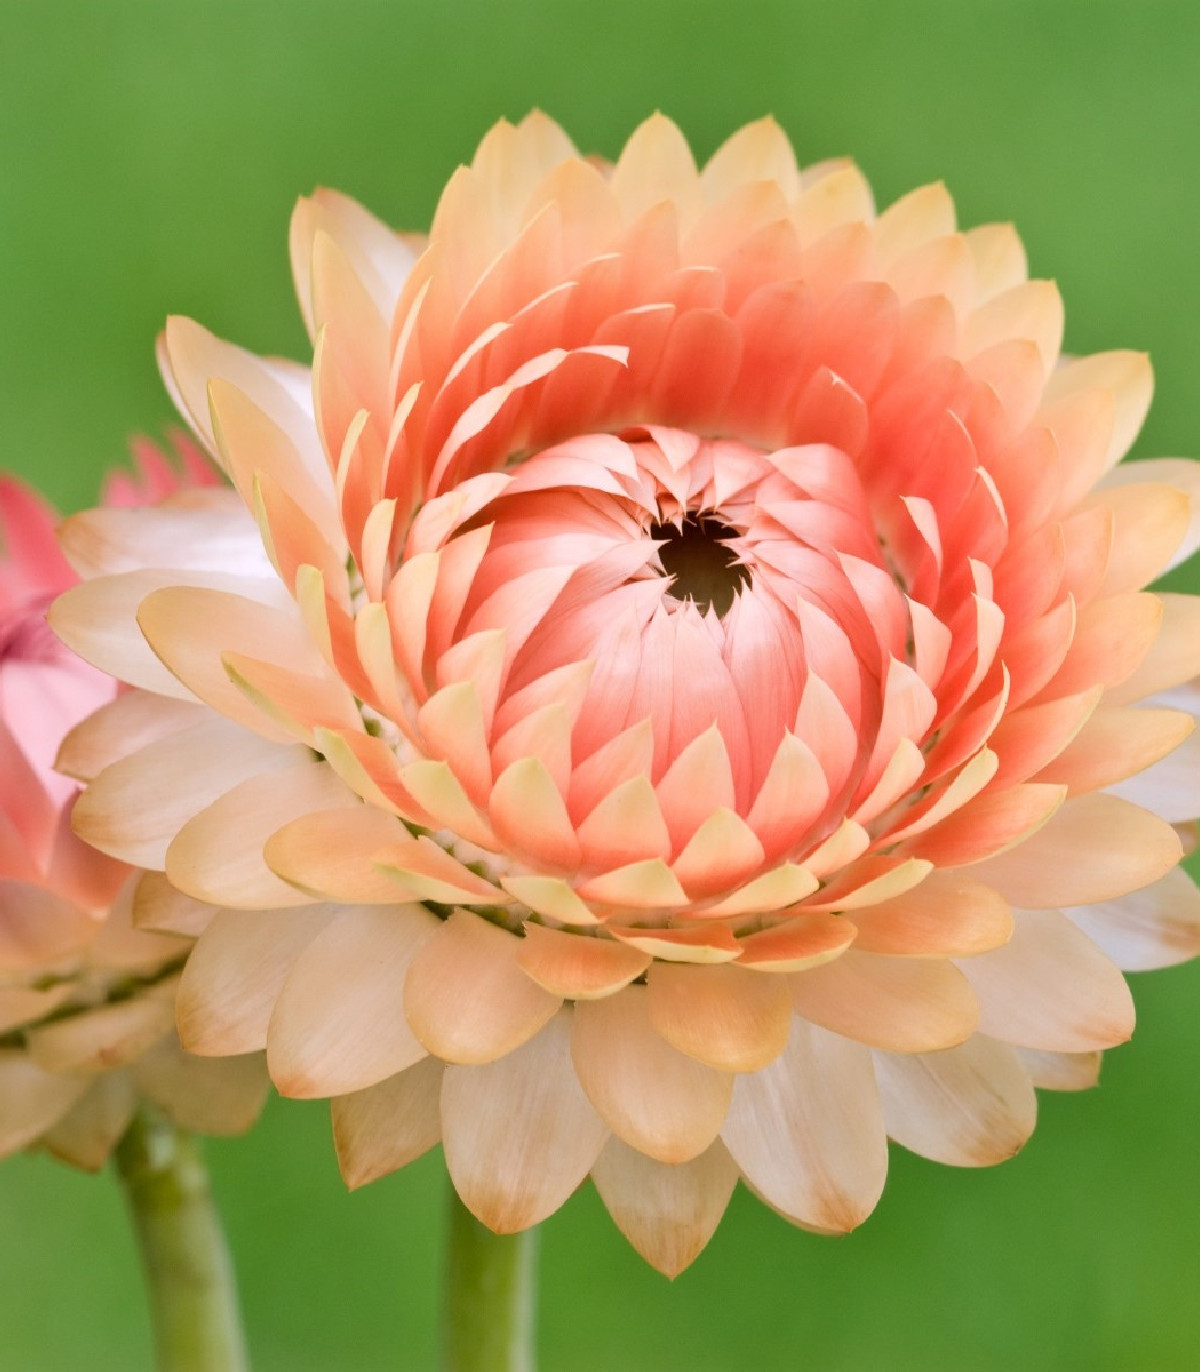 Smil listenatý Silvery Rose - Helichrysum bracteatum - prodej semen - 500ks